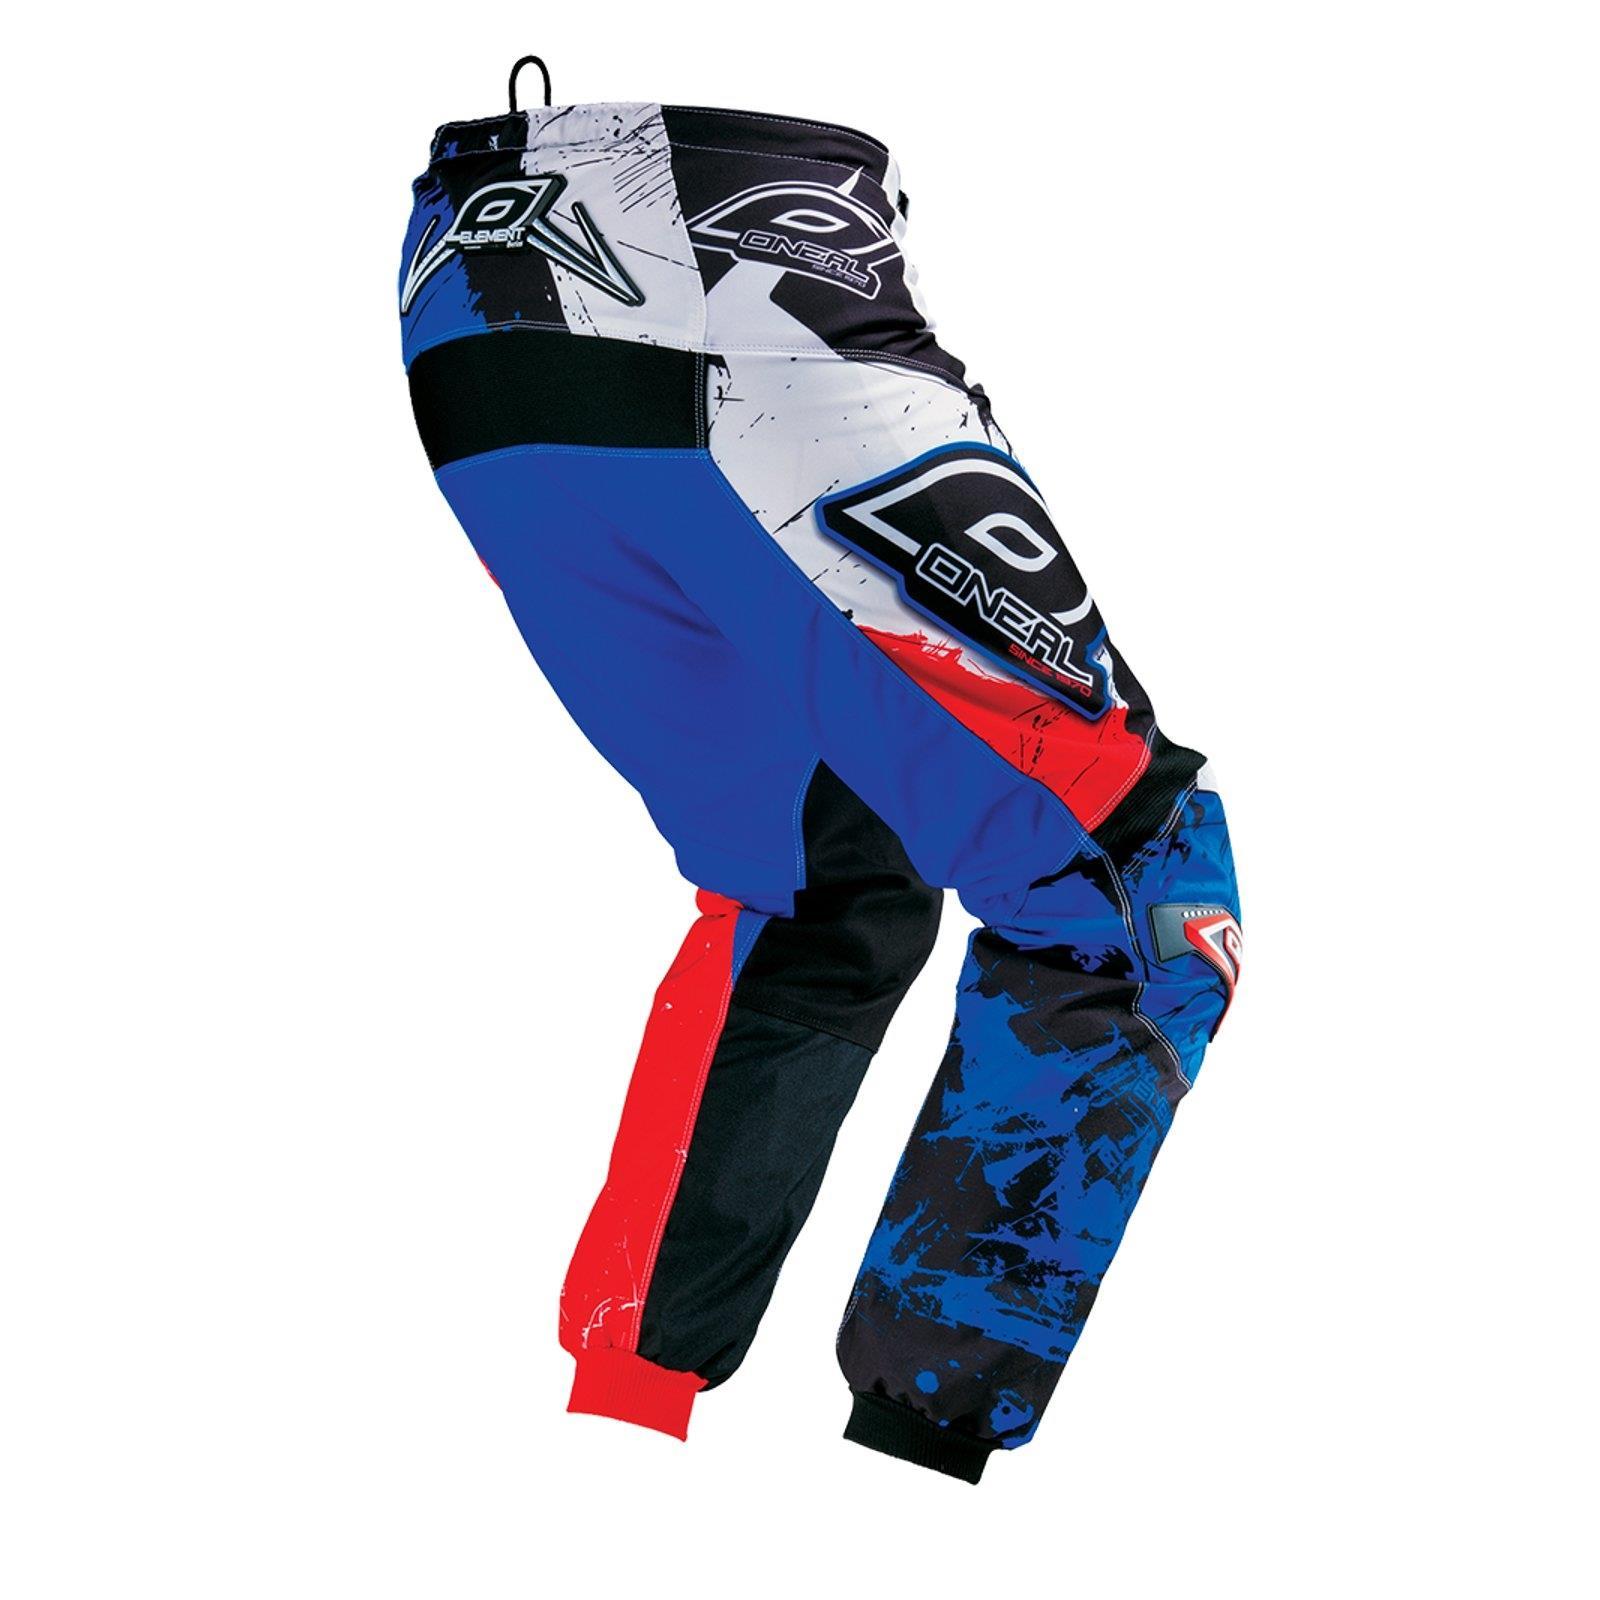 ONeal-pantalones-de-Jersey-de-los-ninos-de-pantalones-cortos-ninos-MX-bicicleta-DH-montana-bicicleta miniatura 65